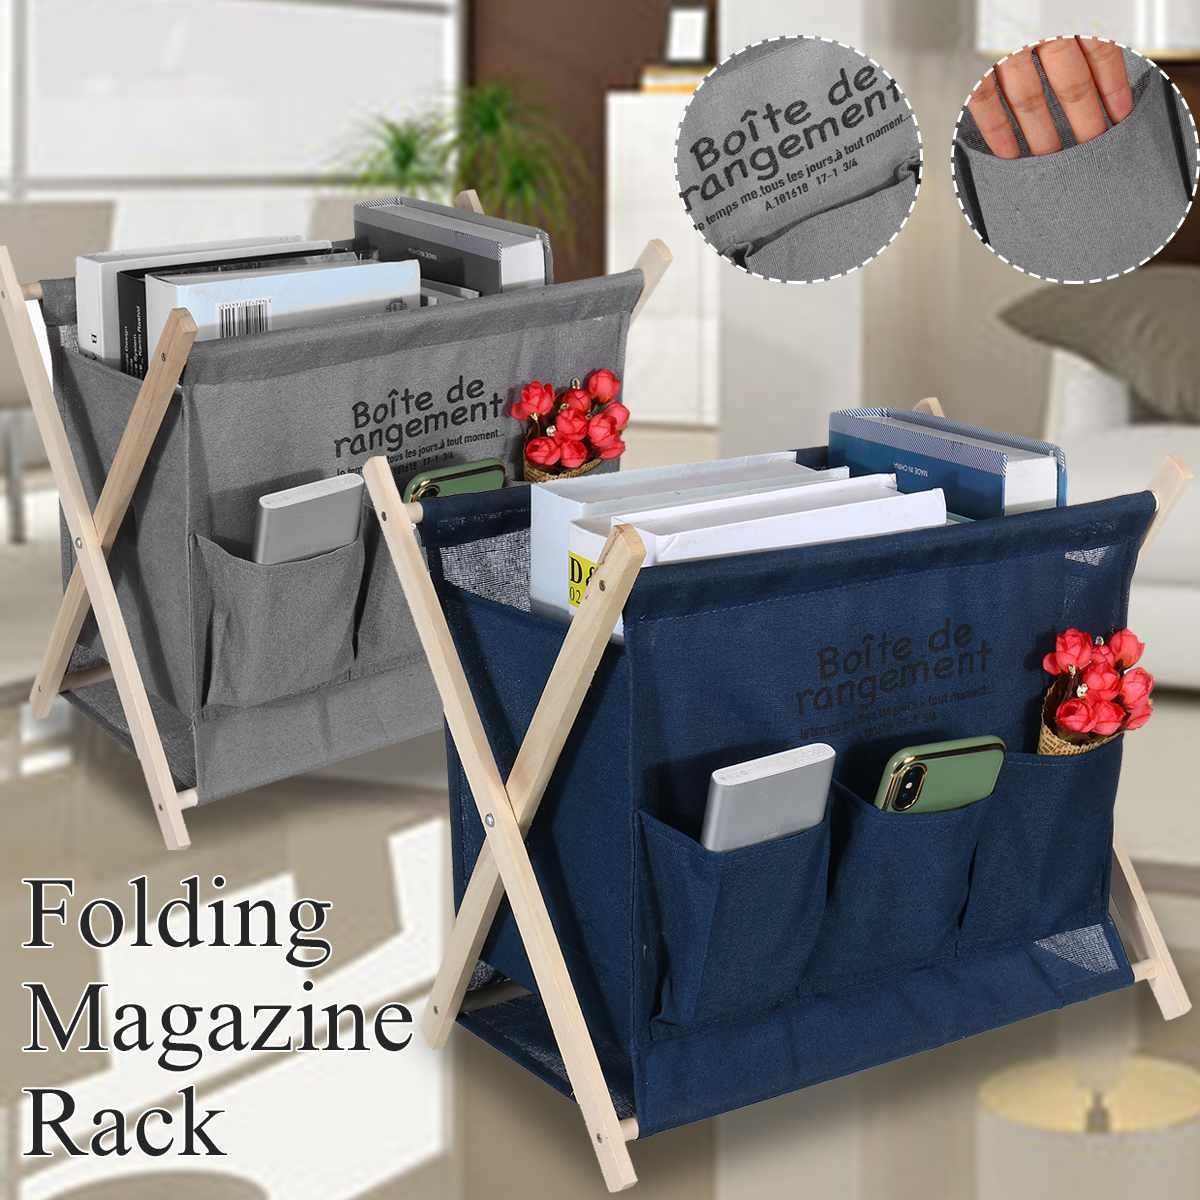 X-Large Laundry Basket Collapsible Desk Storage Rack Laundry Hamper Bedroom Dirty Clothes Organizer Desk Magazine Holder